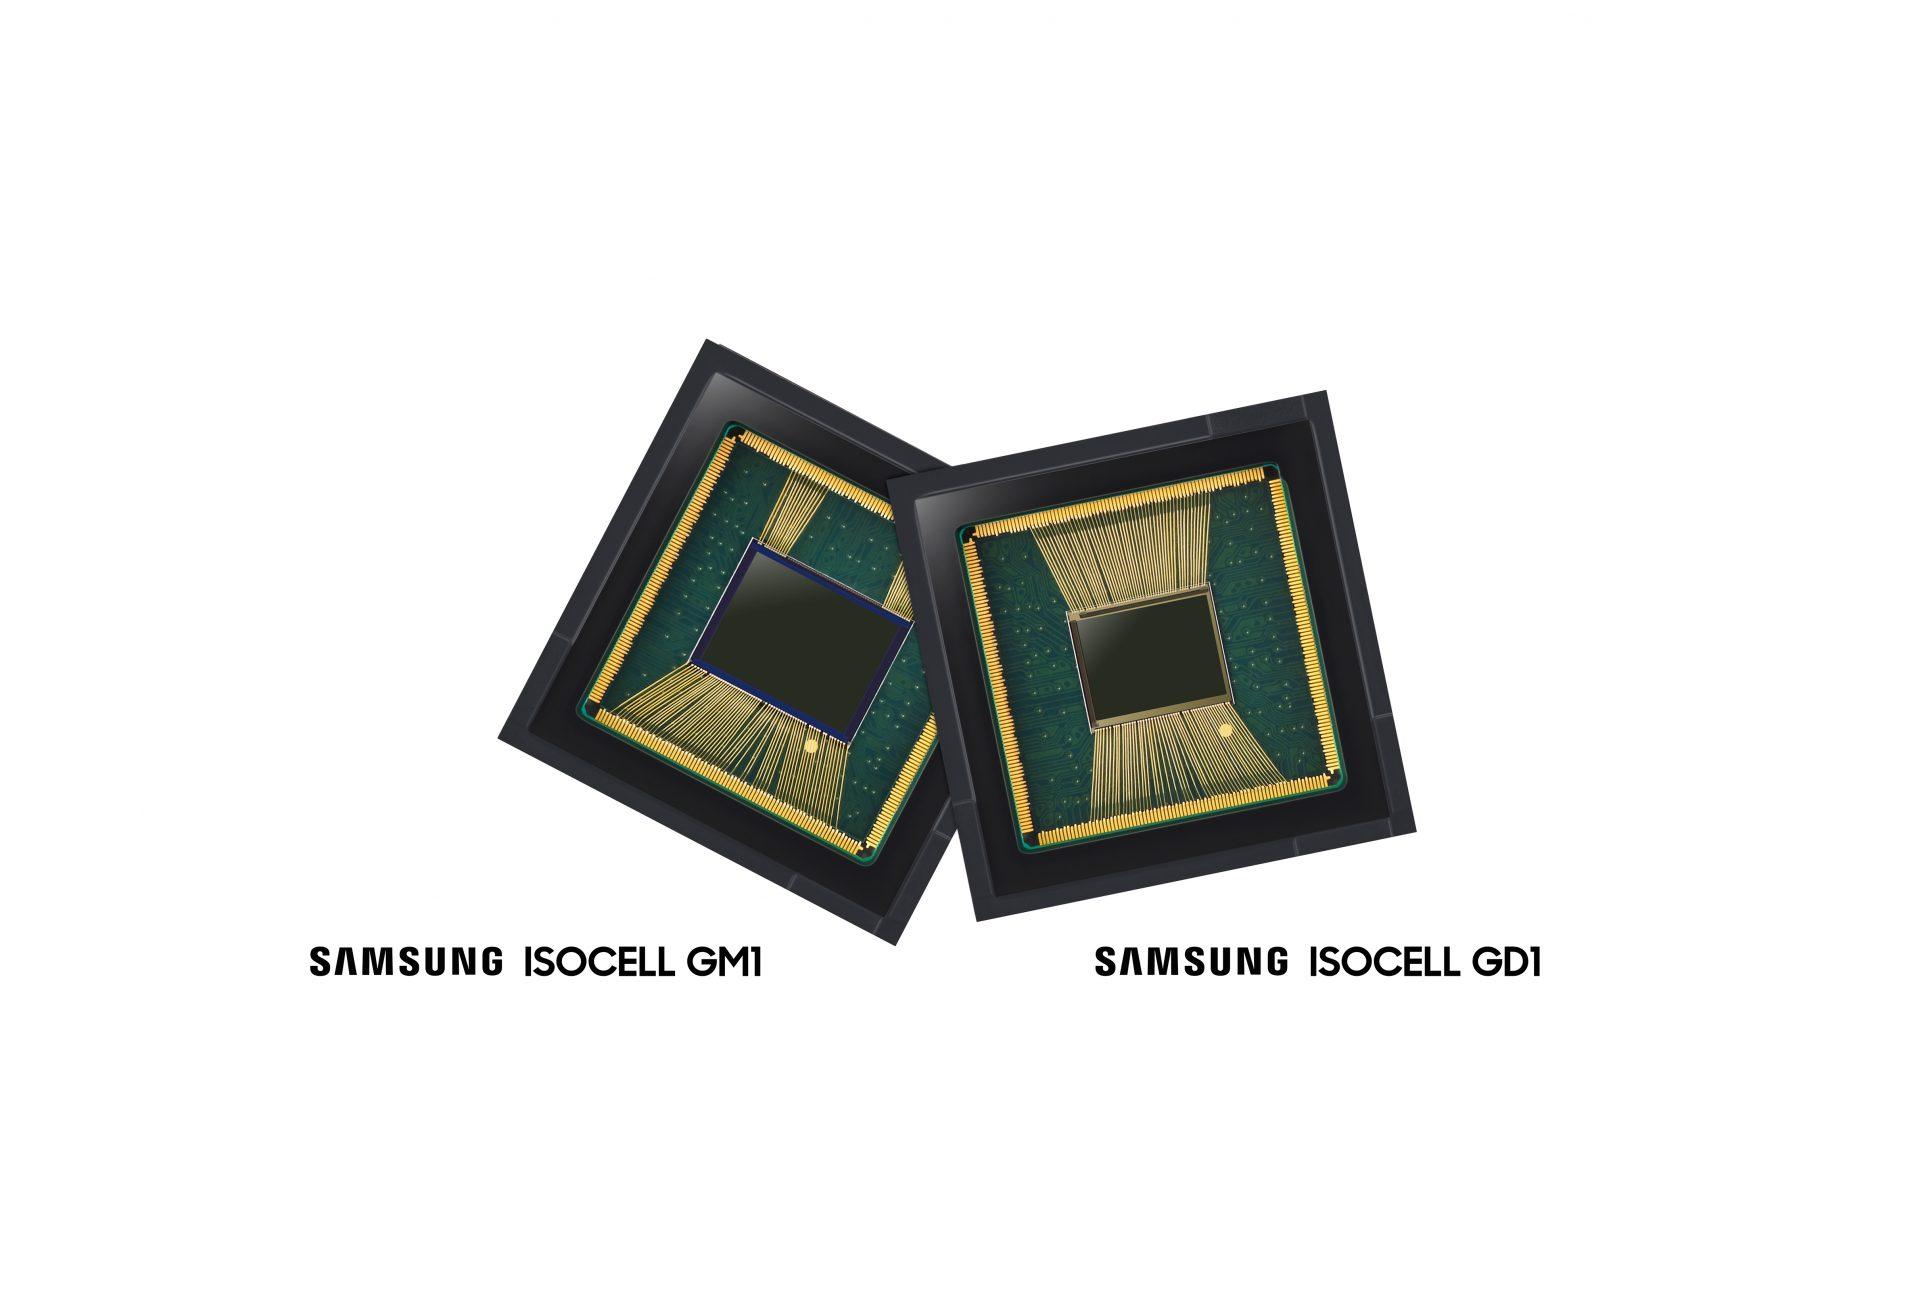 Samsung ra mắt 2 cảm biến camera siêu nhỏ 0,8 micromet (μm) ISOCELL Bright cho smartphone Galaxy